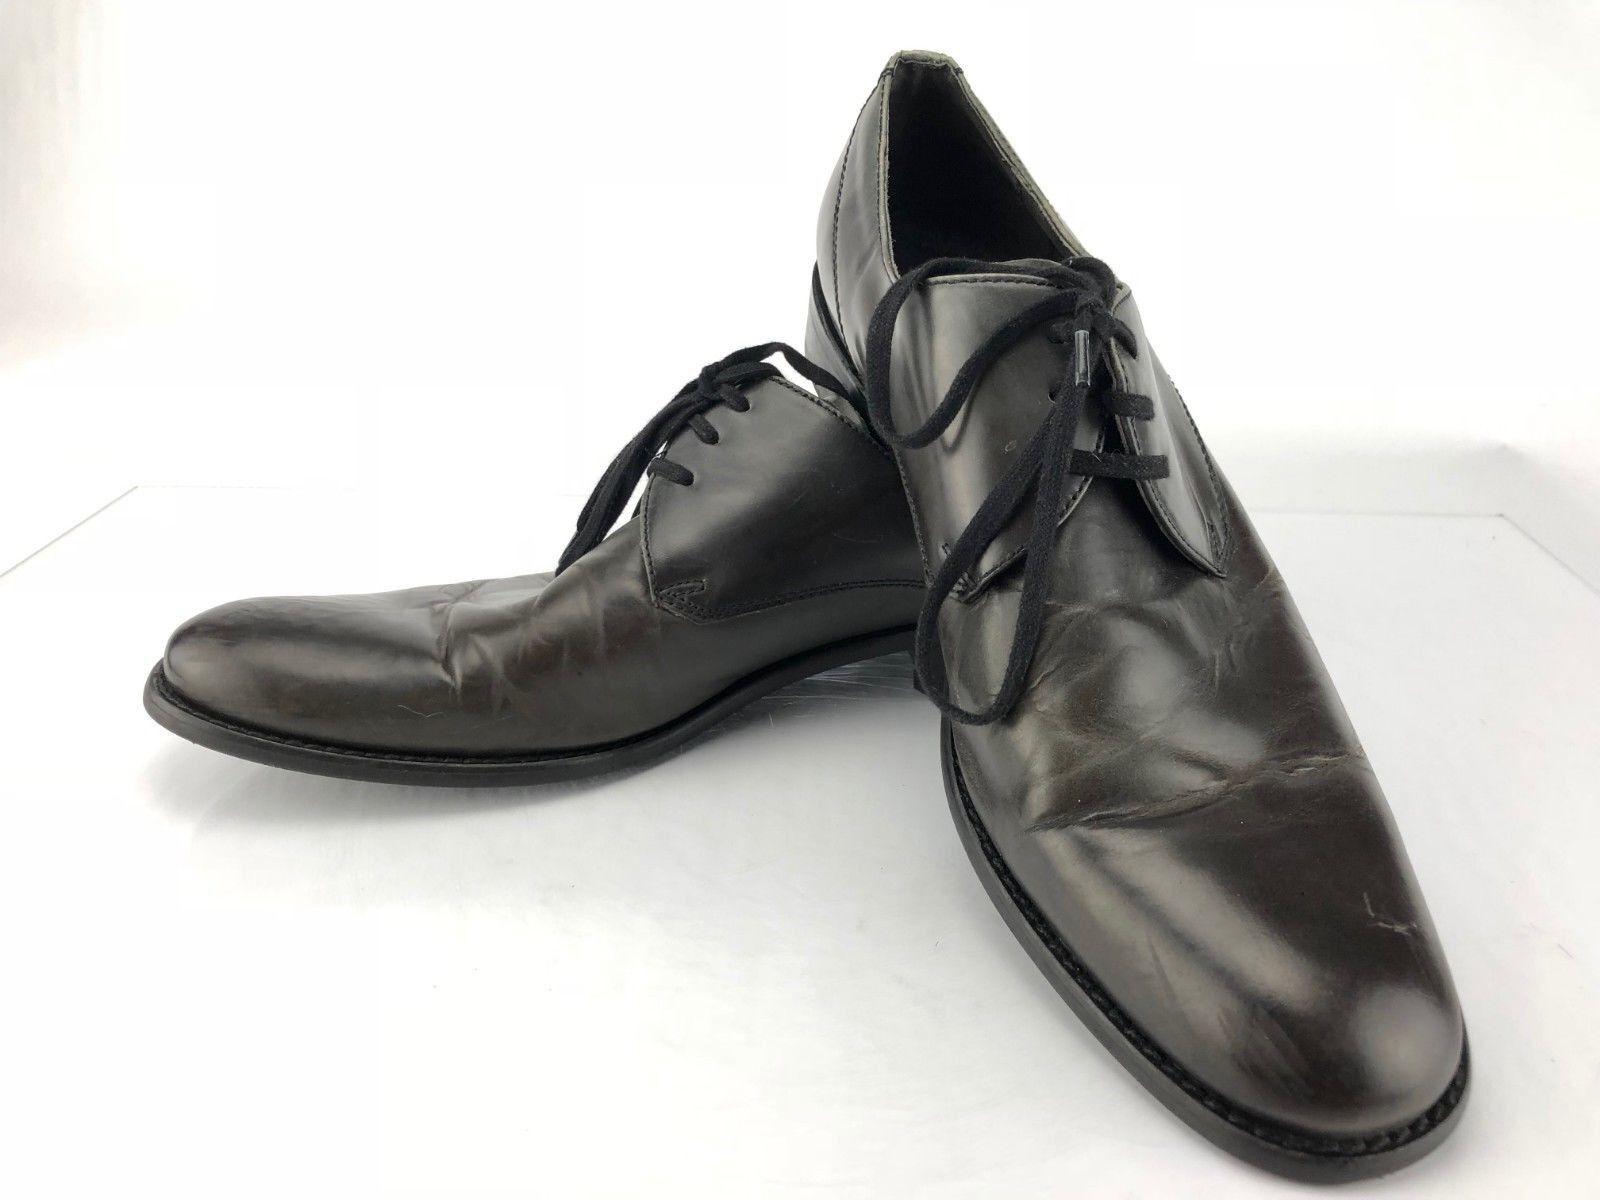 John Varvatos Dress shoes - Brown Leather Lace Up Formal Derby Men's Size 10M